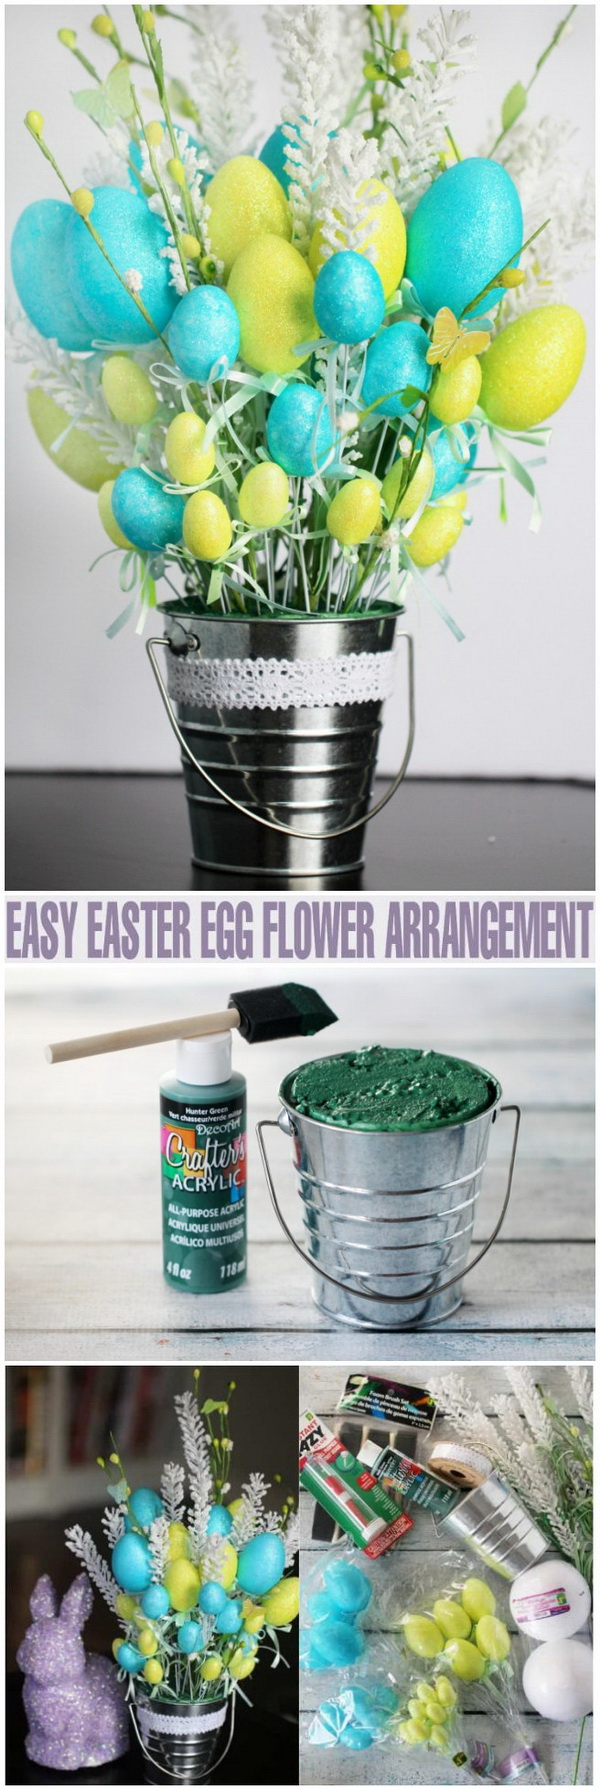 DIY Easter Decoration Ideas: Easy Easter Egg Flower Arrangement.